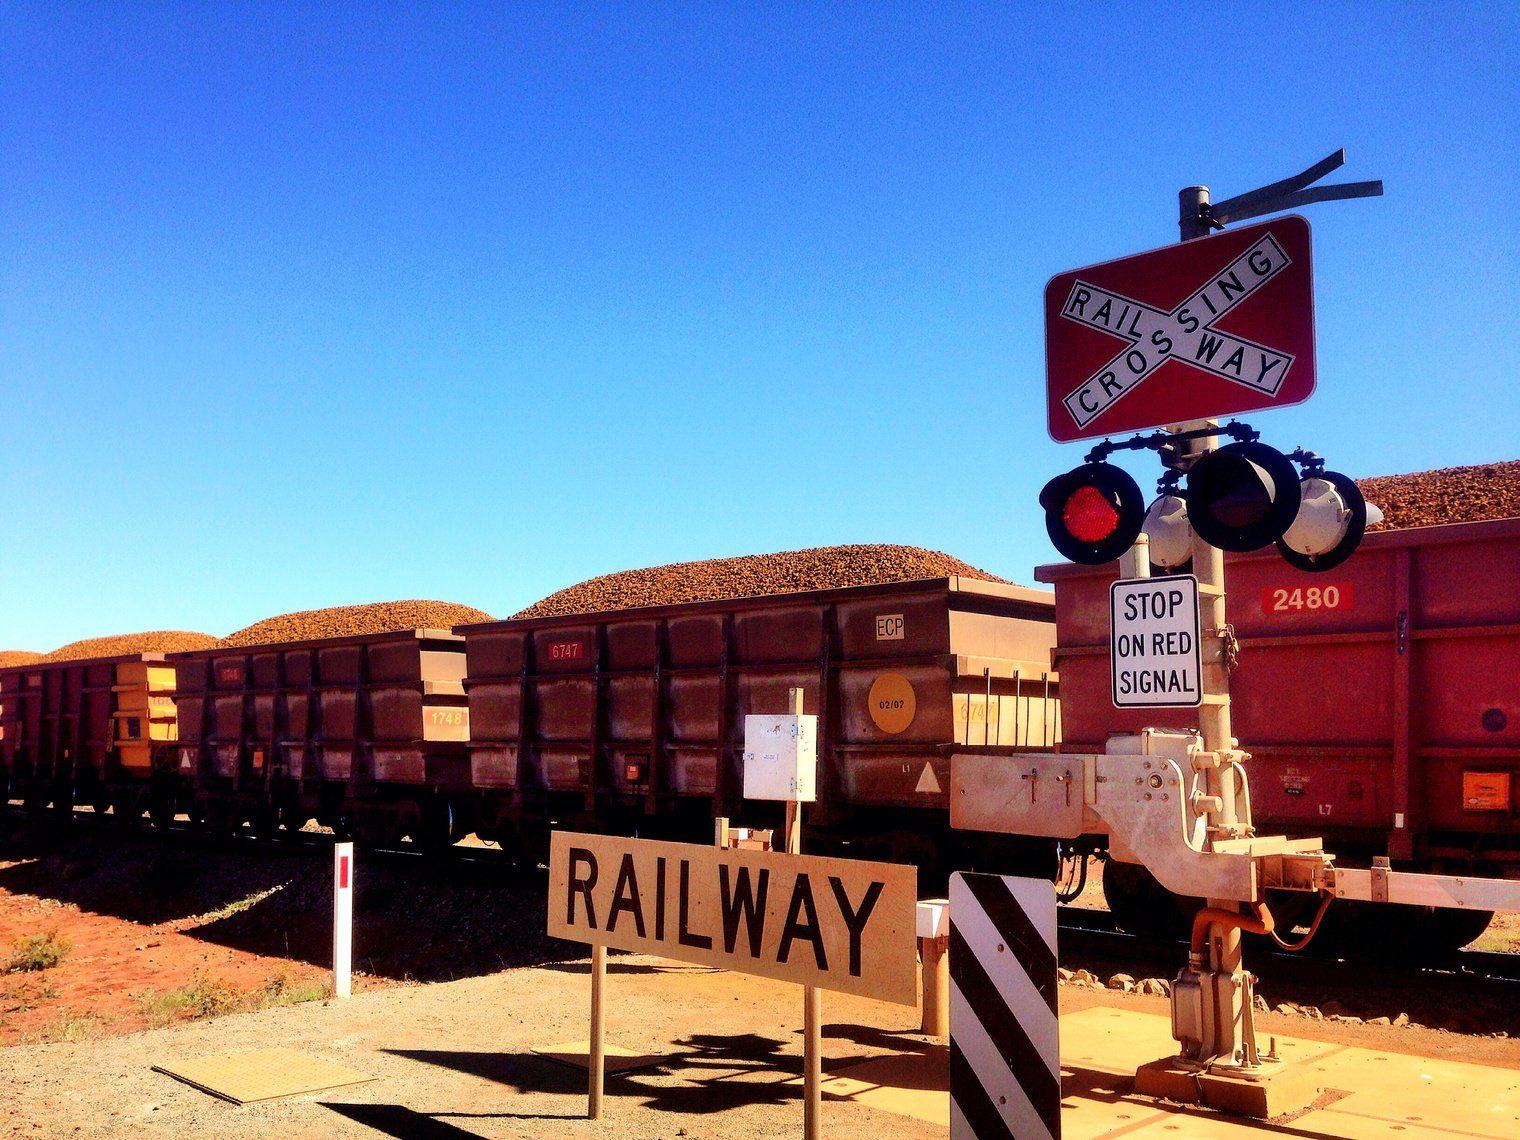 Mining trains in Pilbara, Western Australia